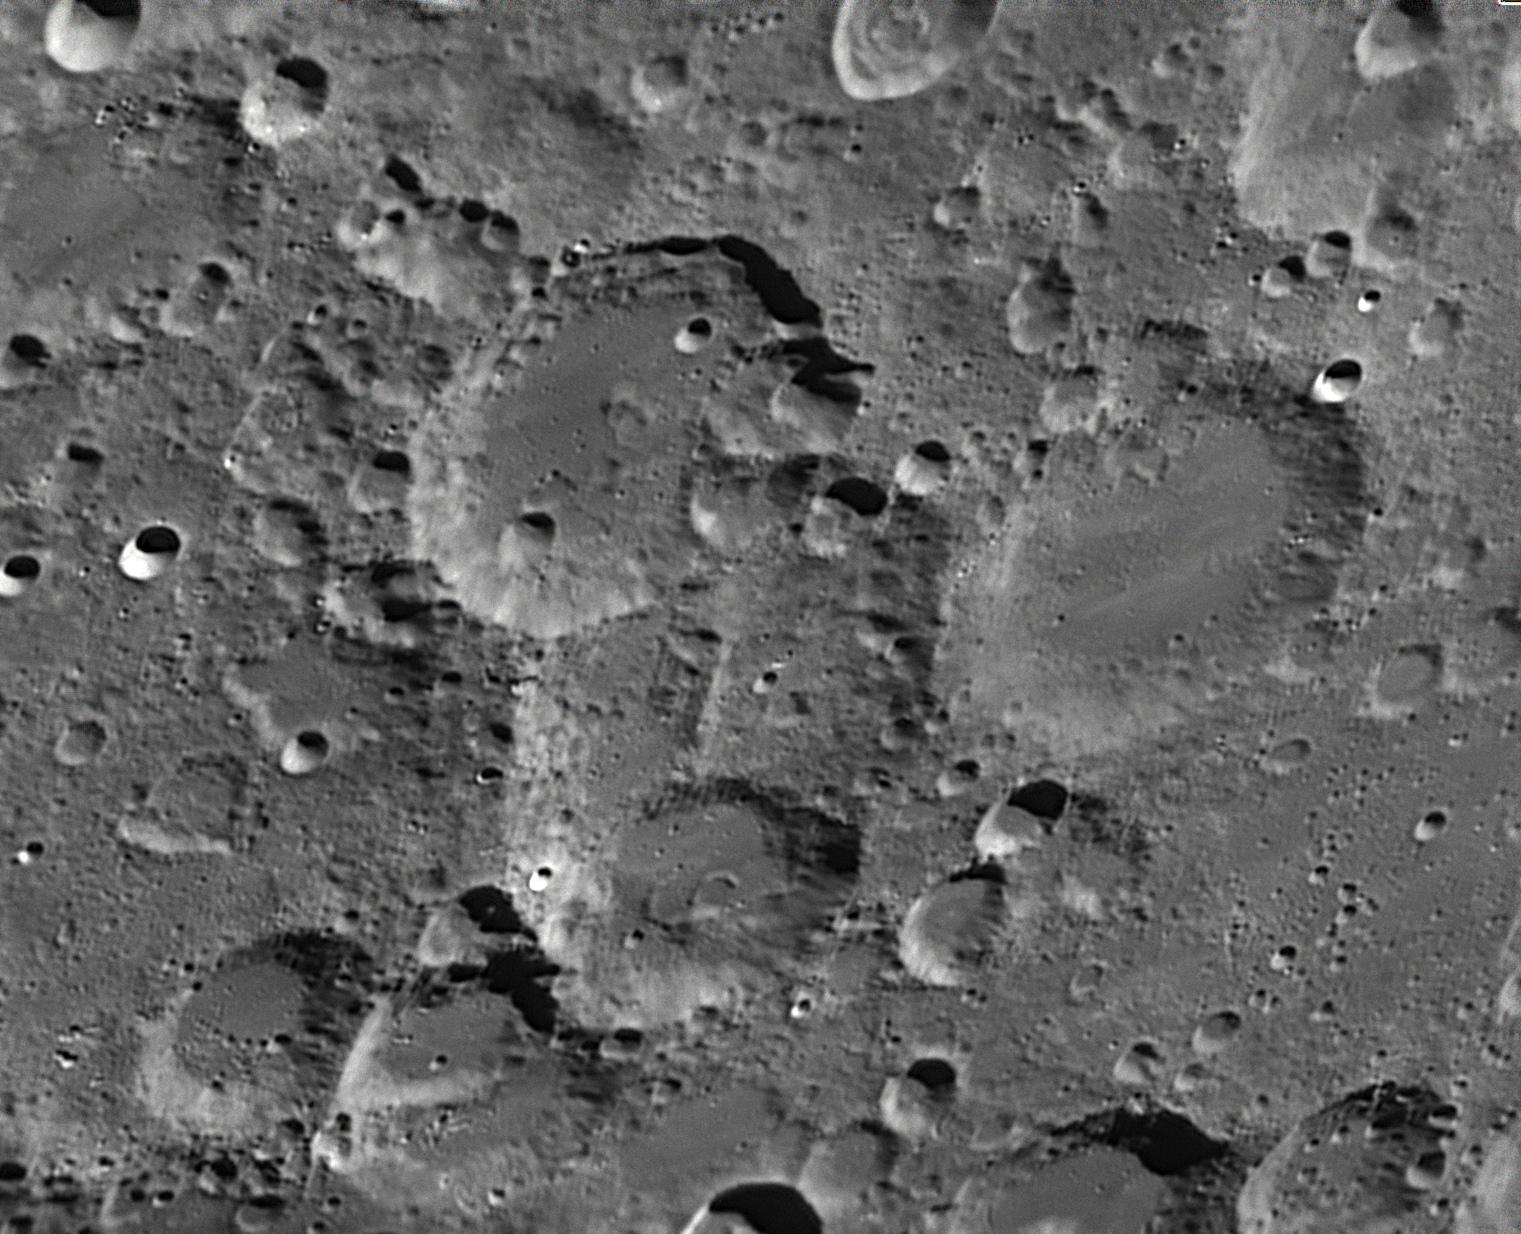 Héraclitus ,Cuvier ,Licétus et Lillius f du 24 avril 2018